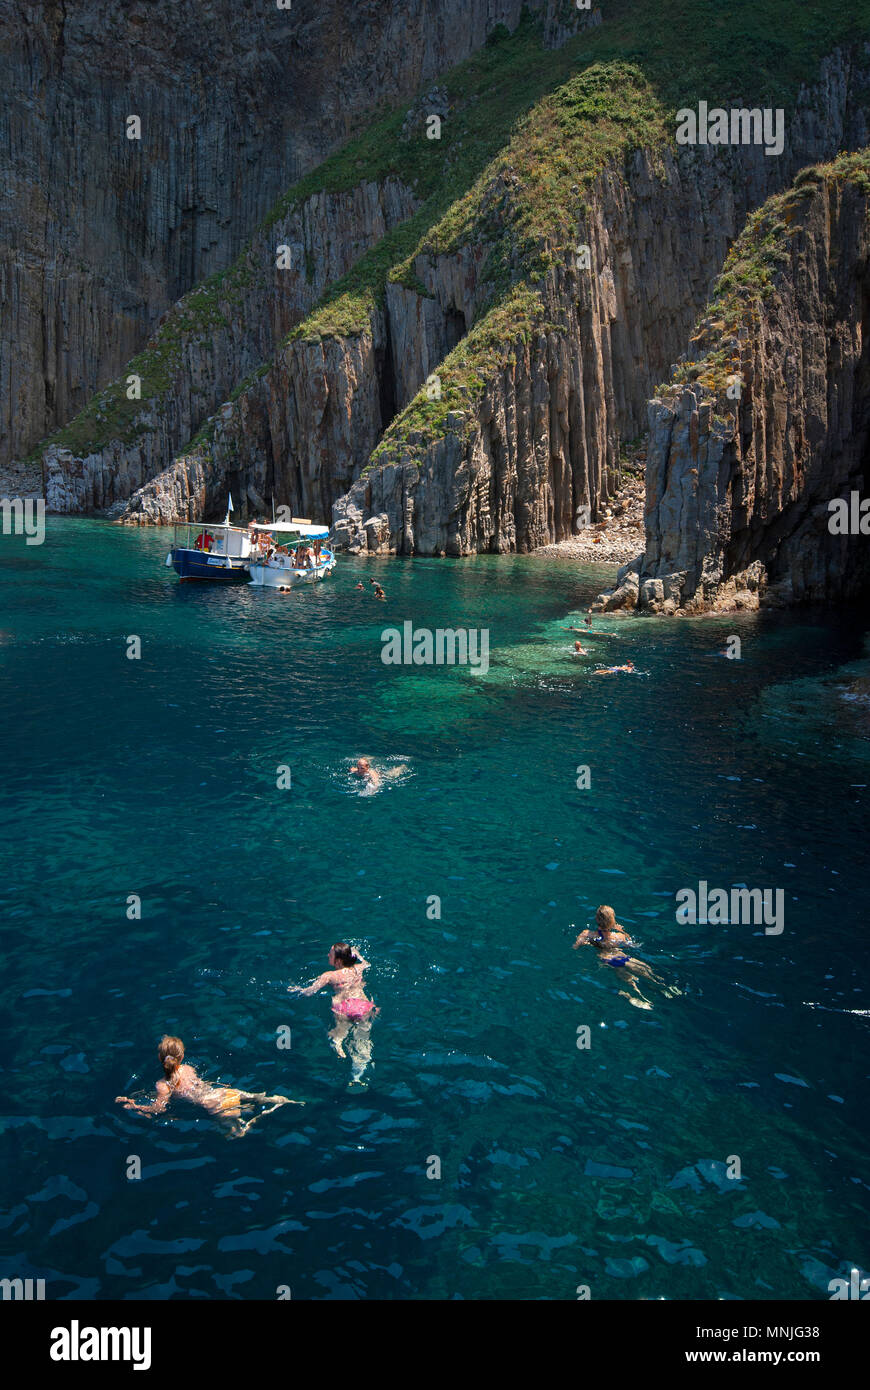 Swimming near the cliffs known as 'the cathedrals', Palmarola Island, Lazio, Italy - Stock Image